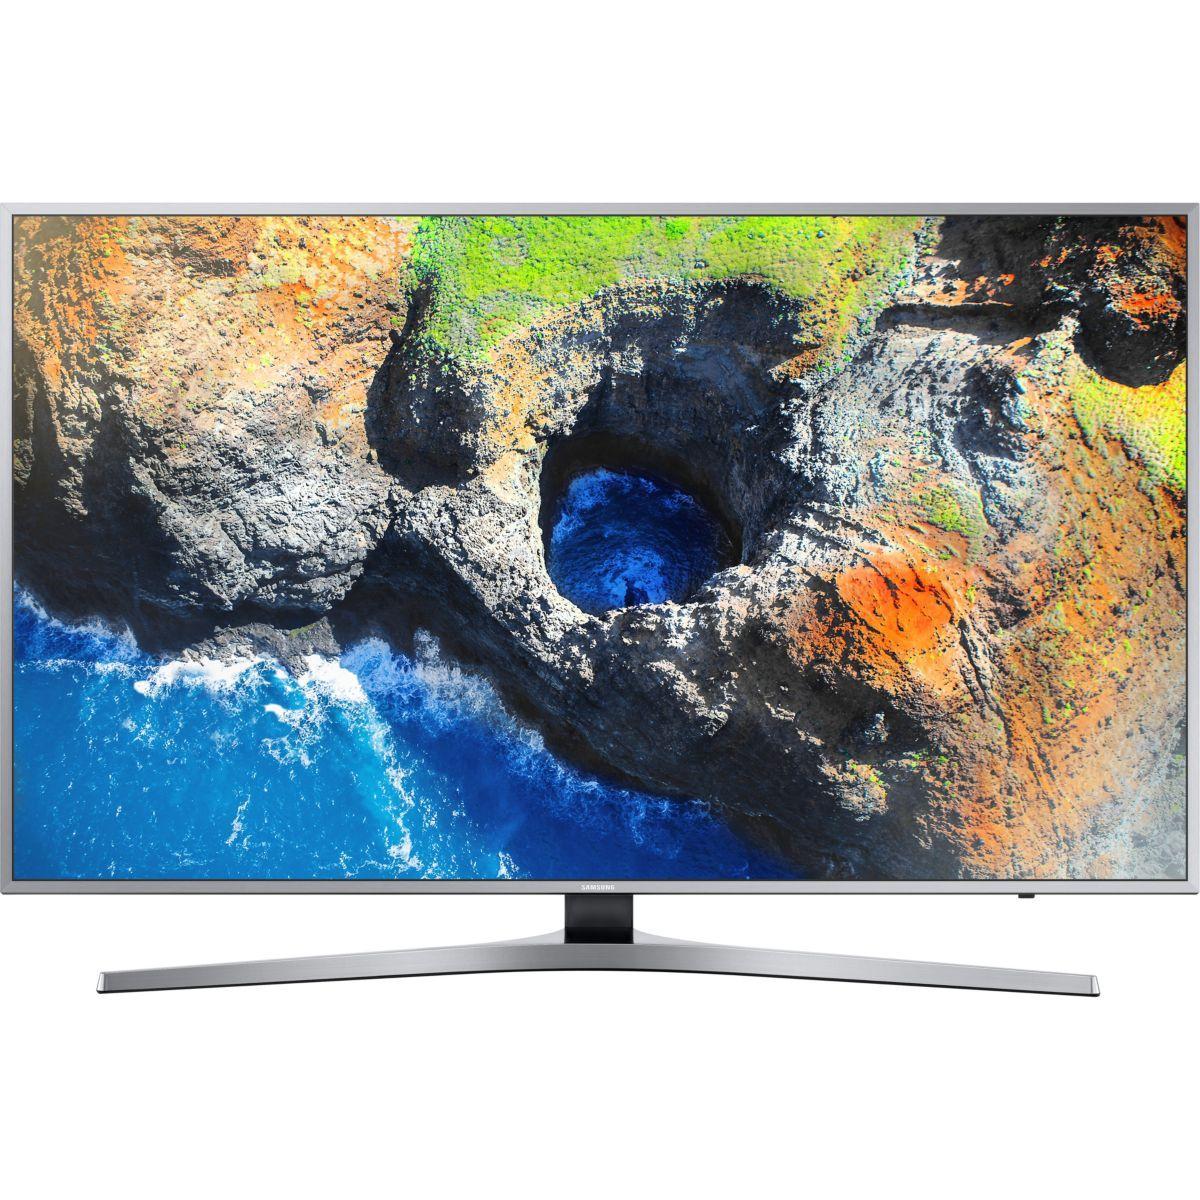 Tv samsung ue49mu6405 4k hdr smart cryst (photo)